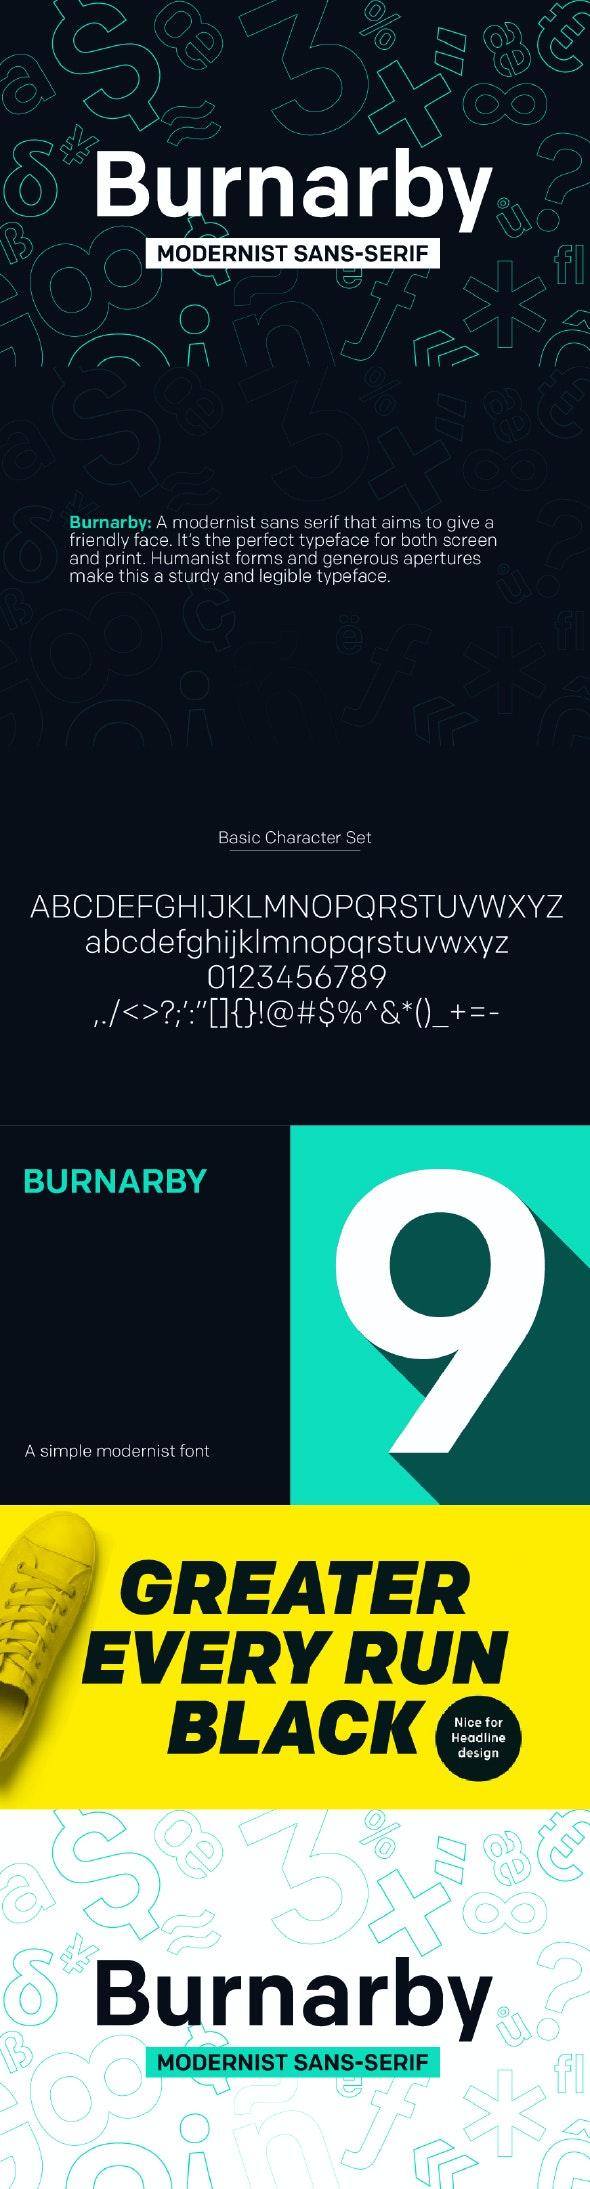 Burnarby Sans - Miscellaneous Sans-Serif